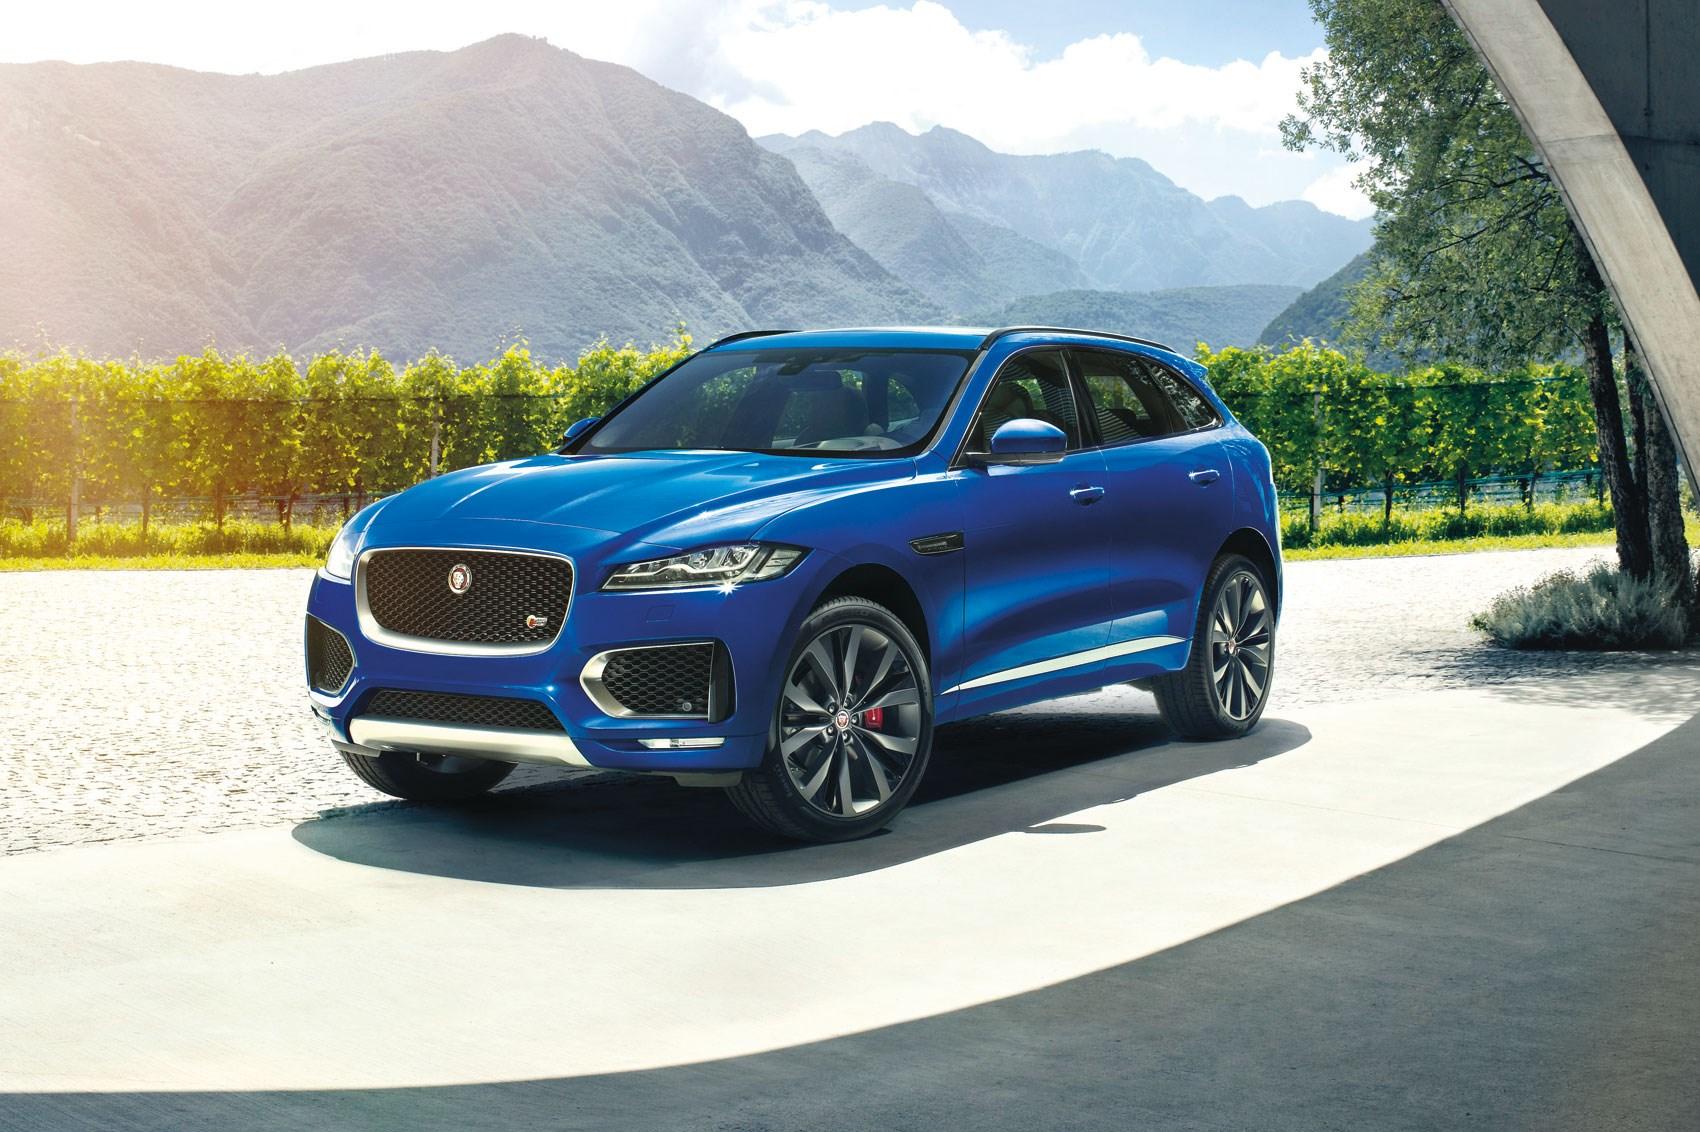 listings f for group automotive sport stewart s r full pace sale jaguar fpace